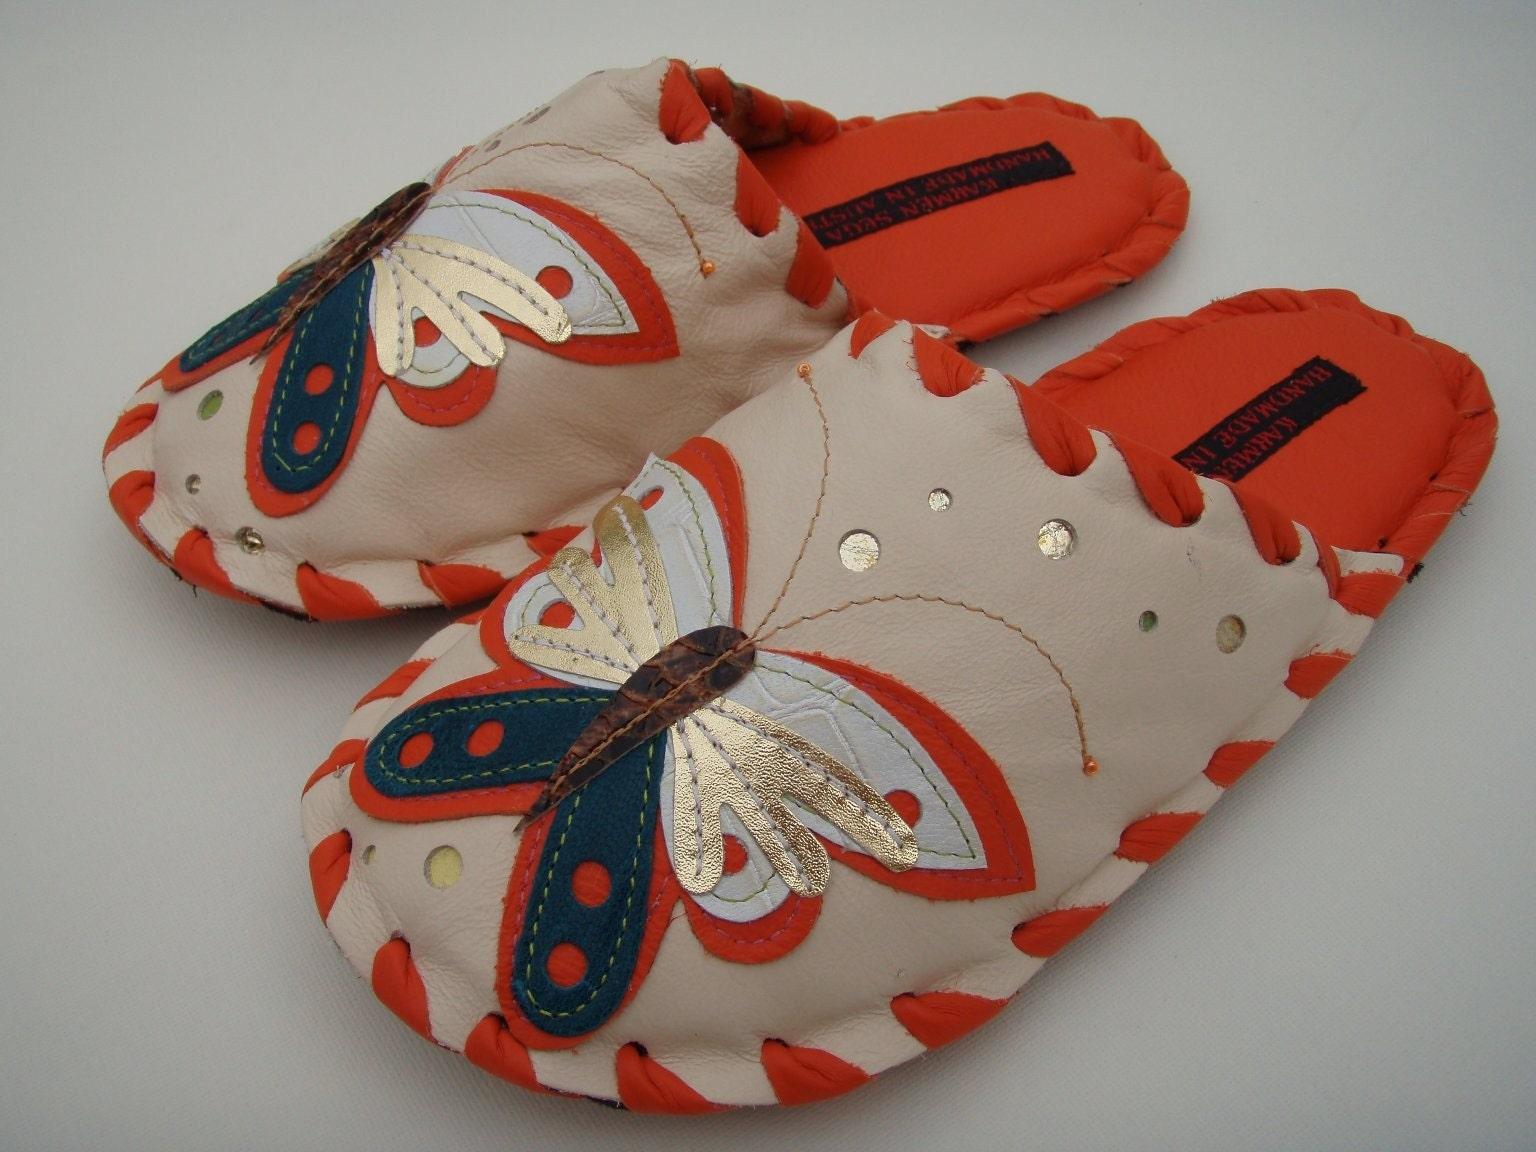 Handmade leather slippers by Karmen Sega - Butterfly in orange